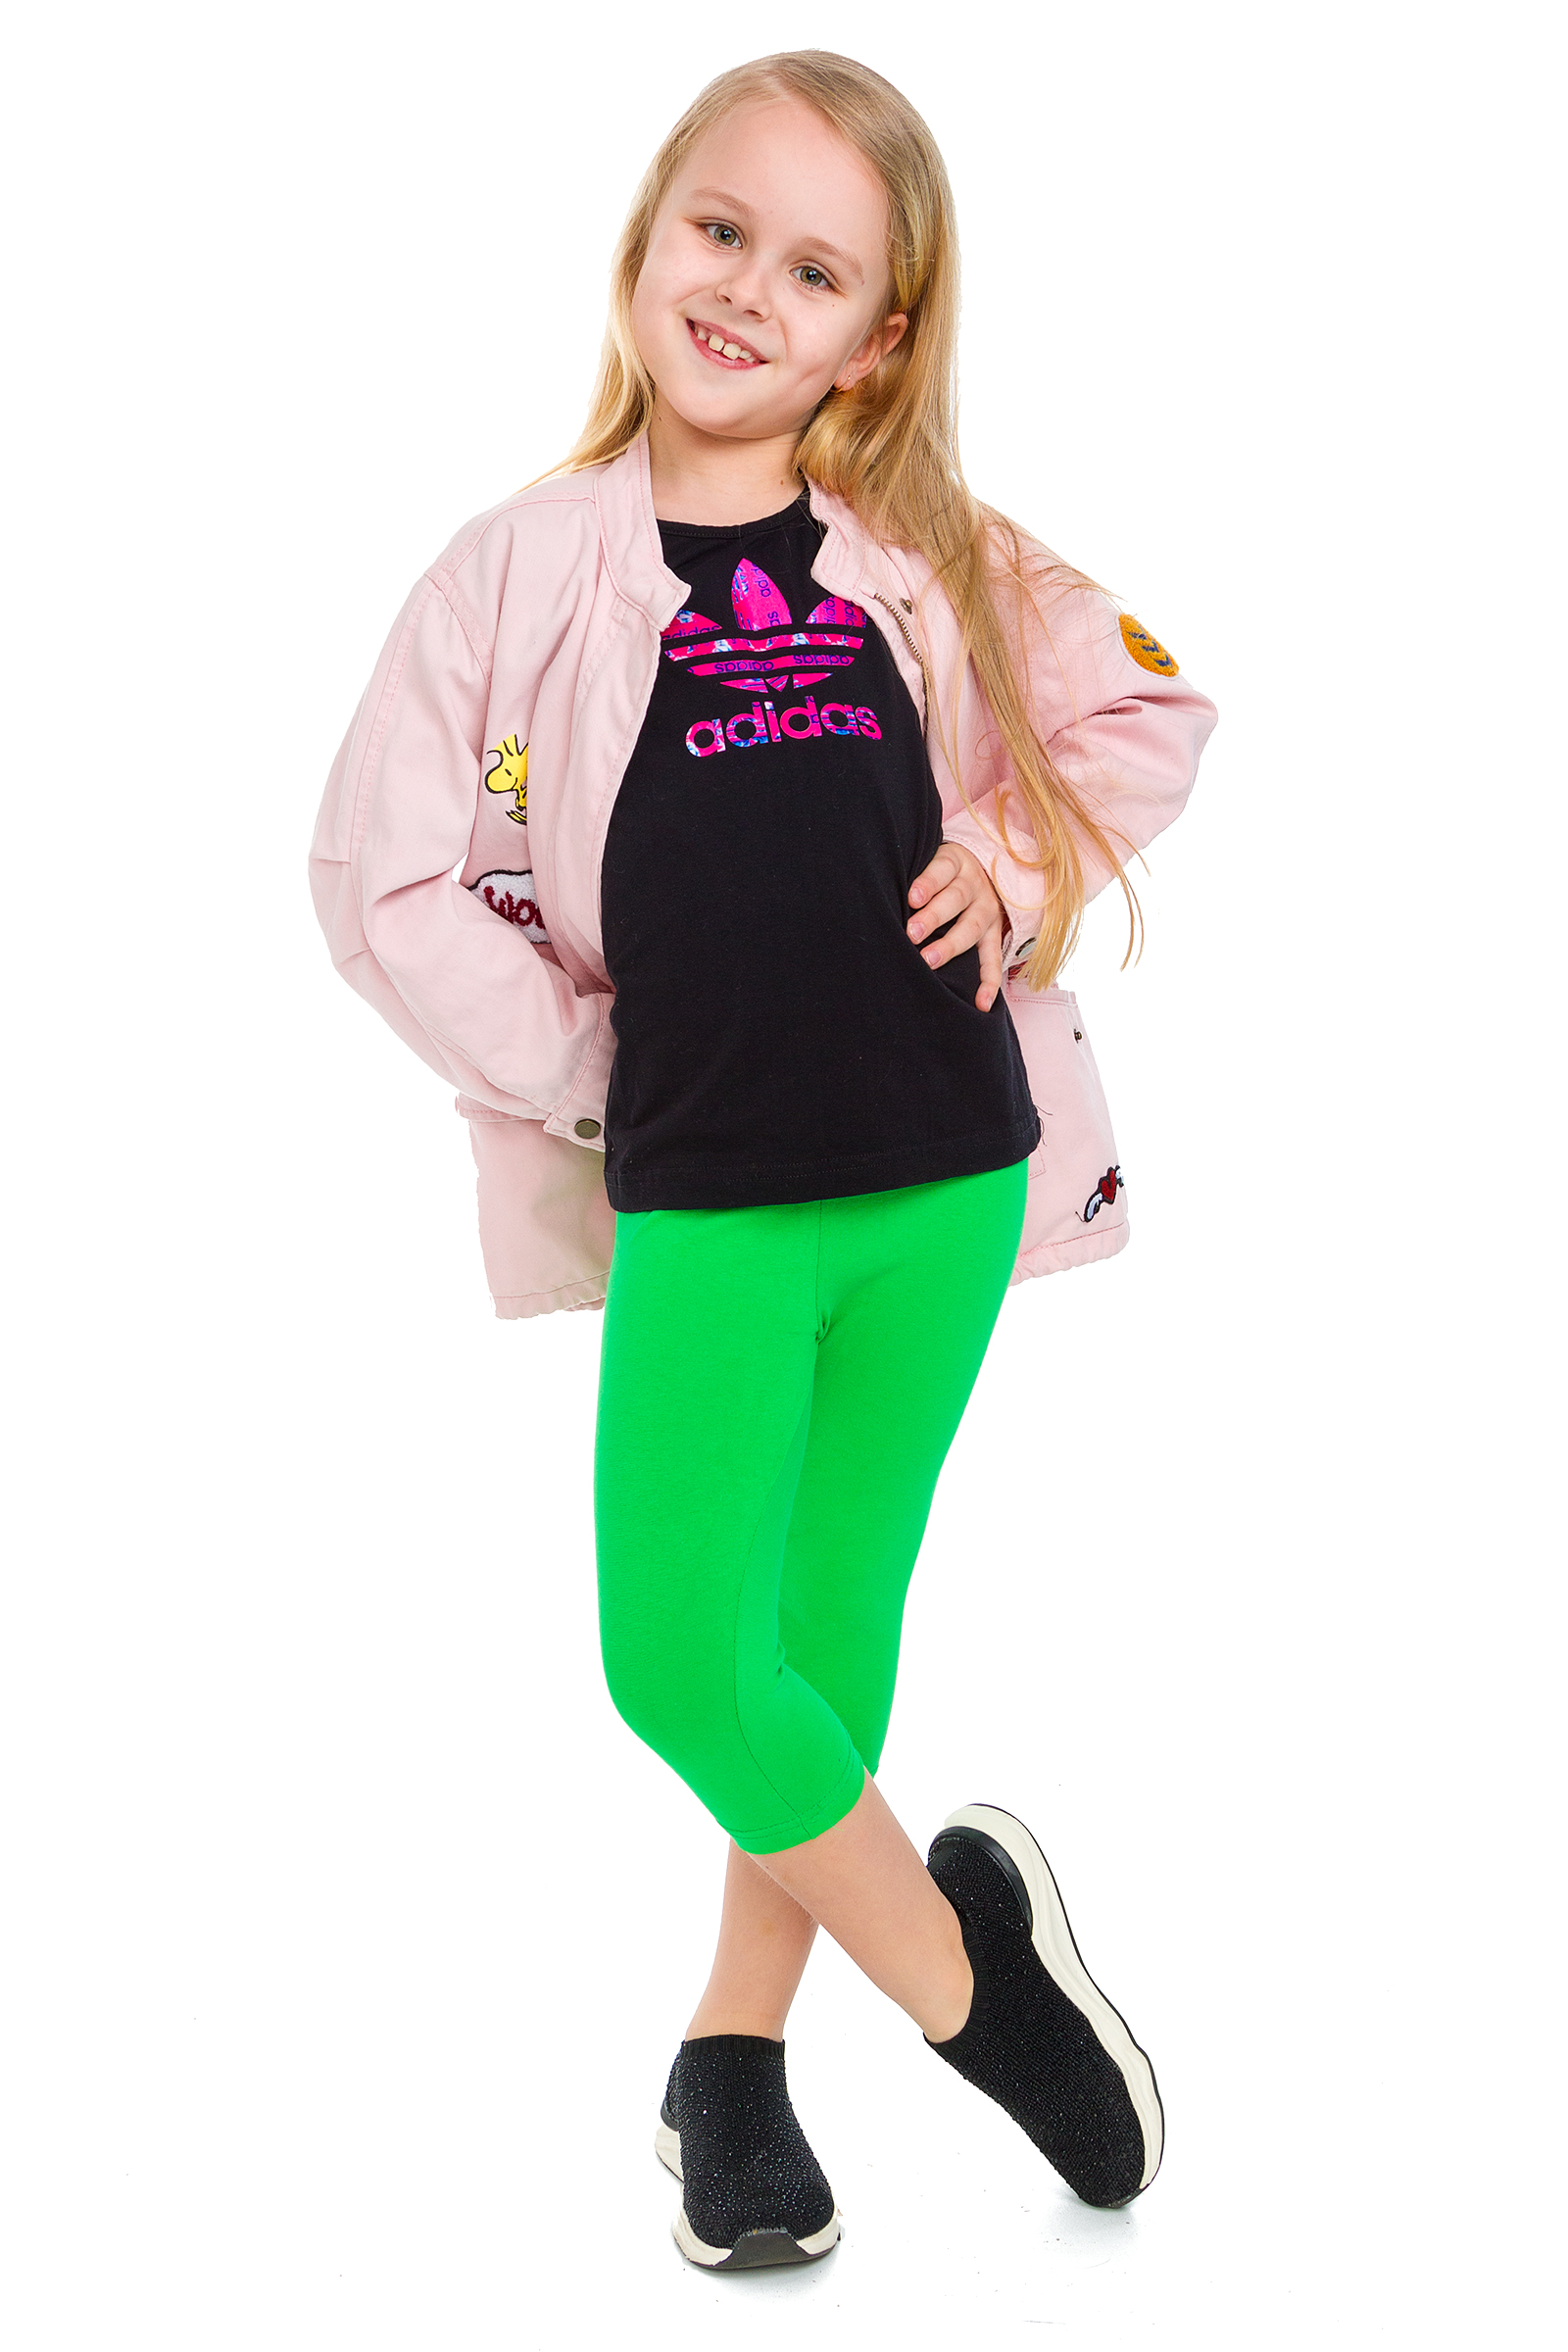 Girls Capri Soft Cotton Leggings Kids Stretchy 3//4 Pants Age 2-13 Years CHILD34